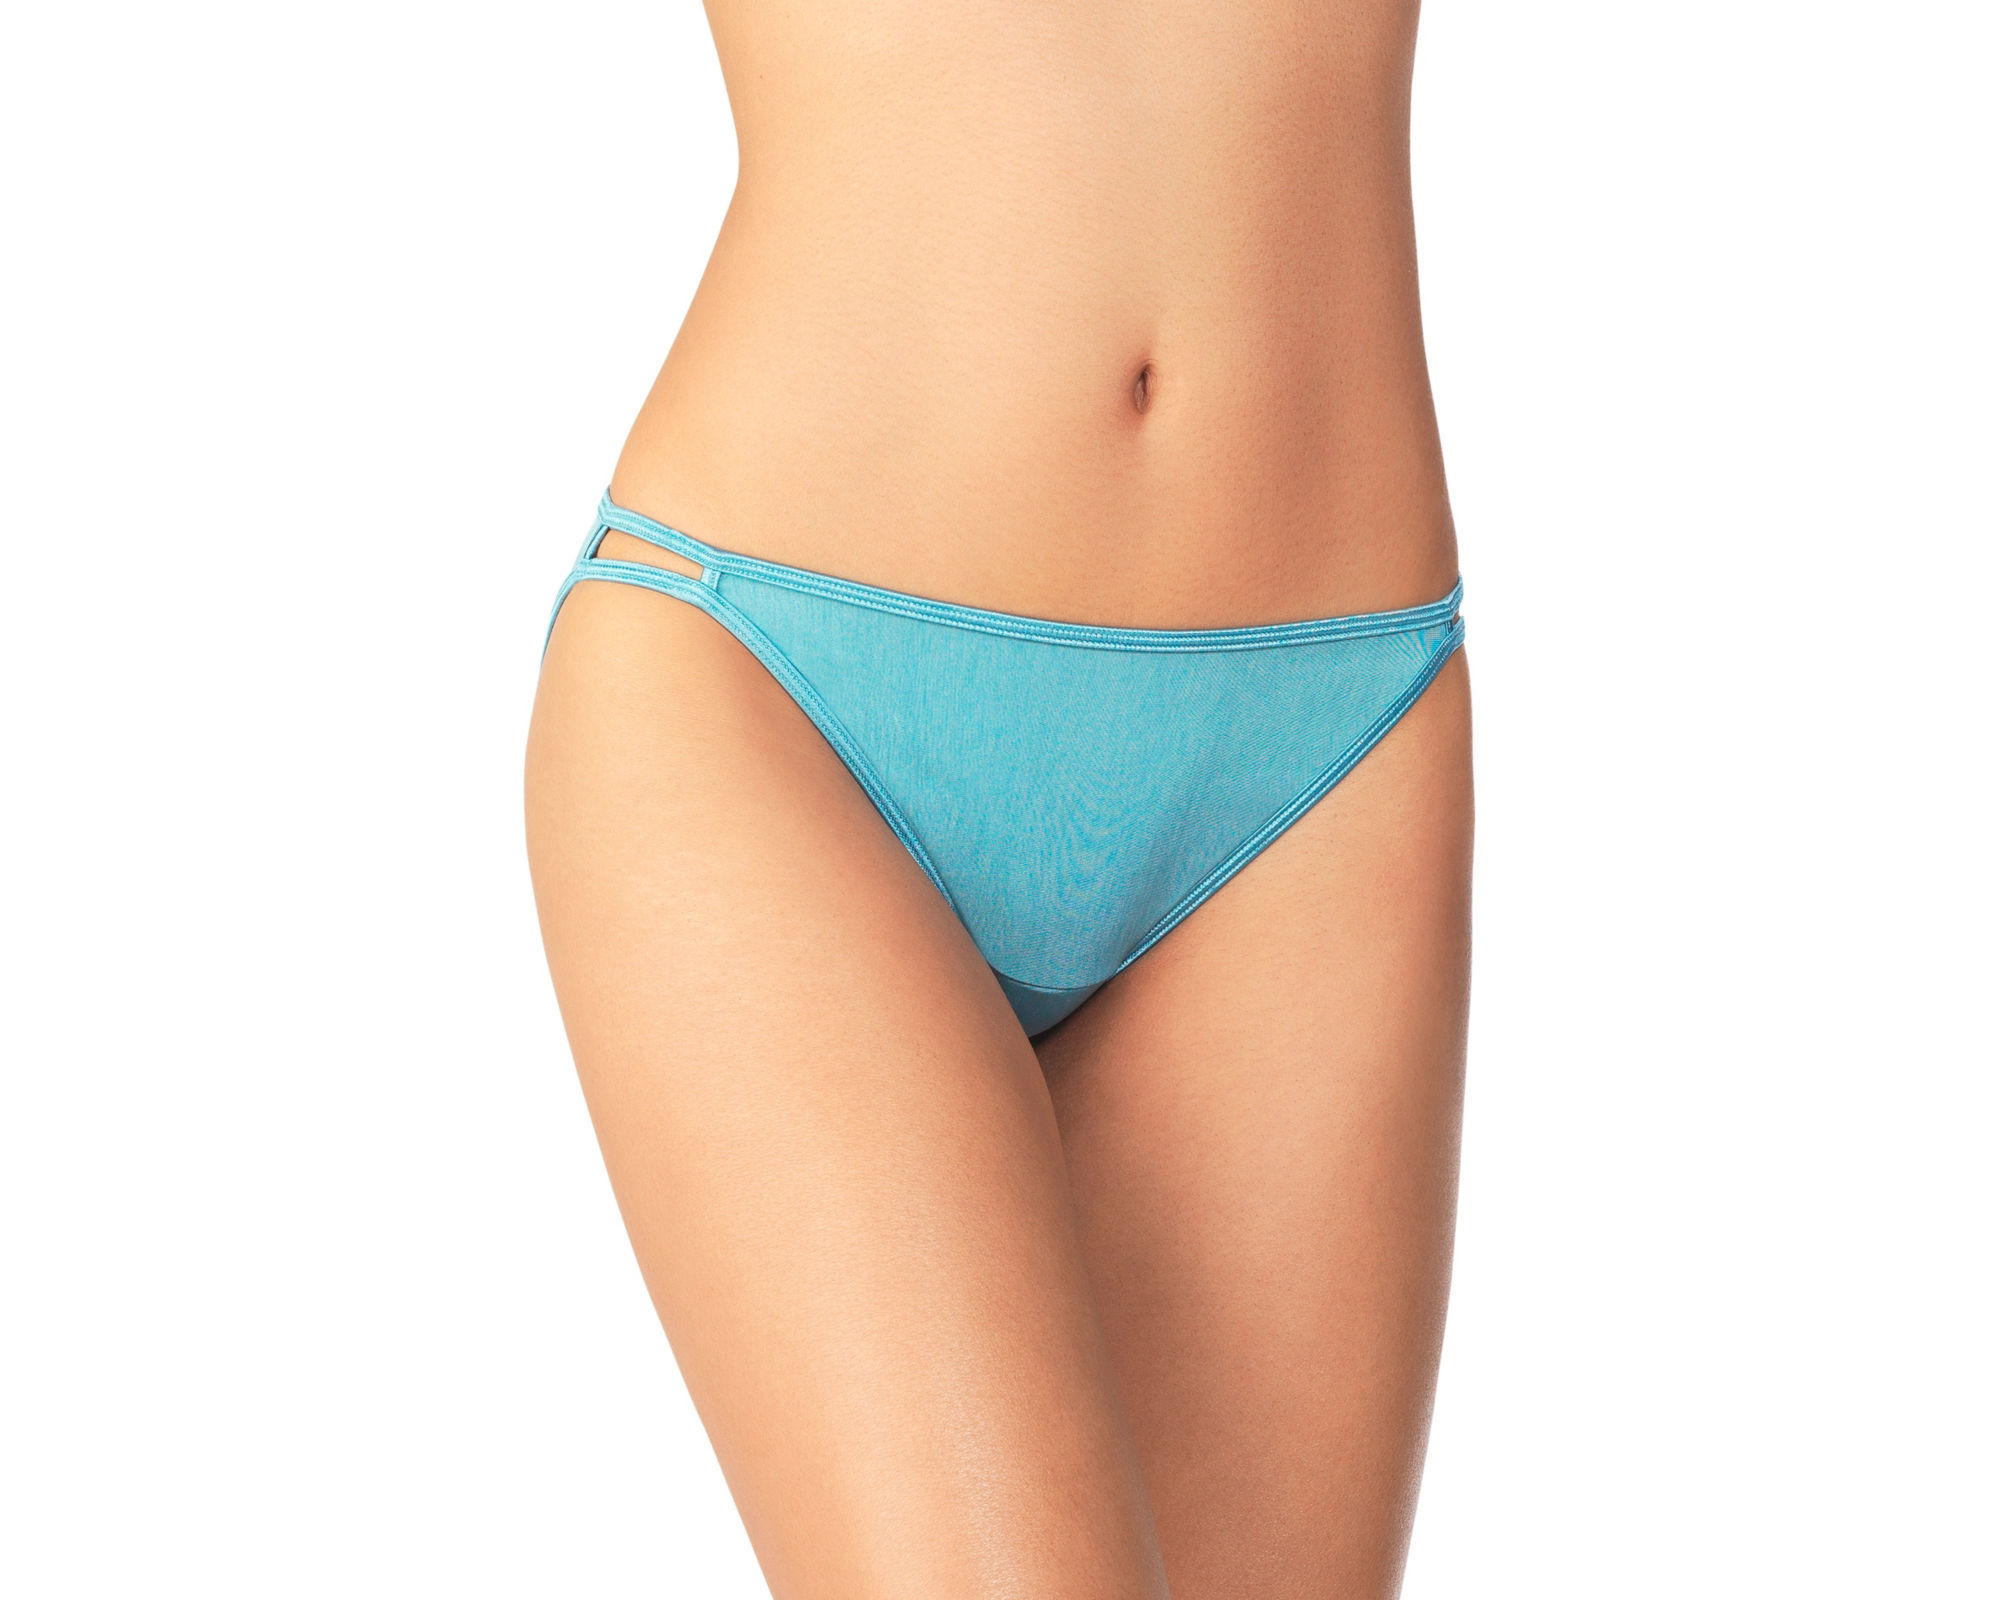 UPC 083626006083 Product Image For 3 Vanity Fair Illumination String Bikini  Style 18108 Size 6 Teal